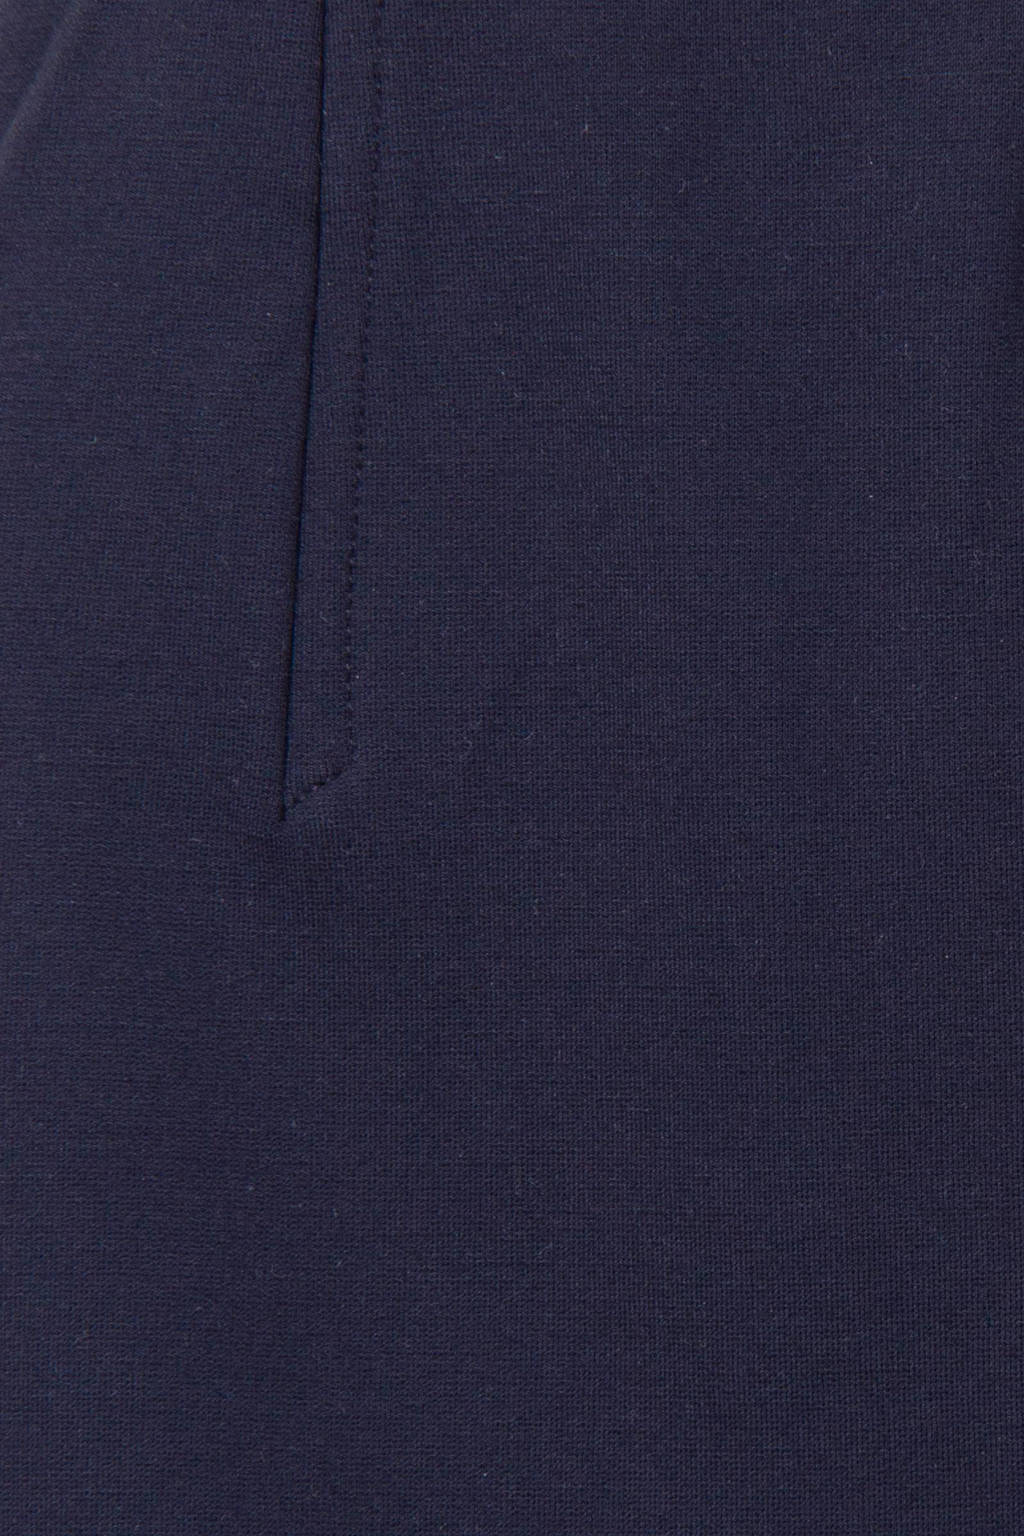 Promiss kokerrok donkerblauw stretch, Donkerblauw